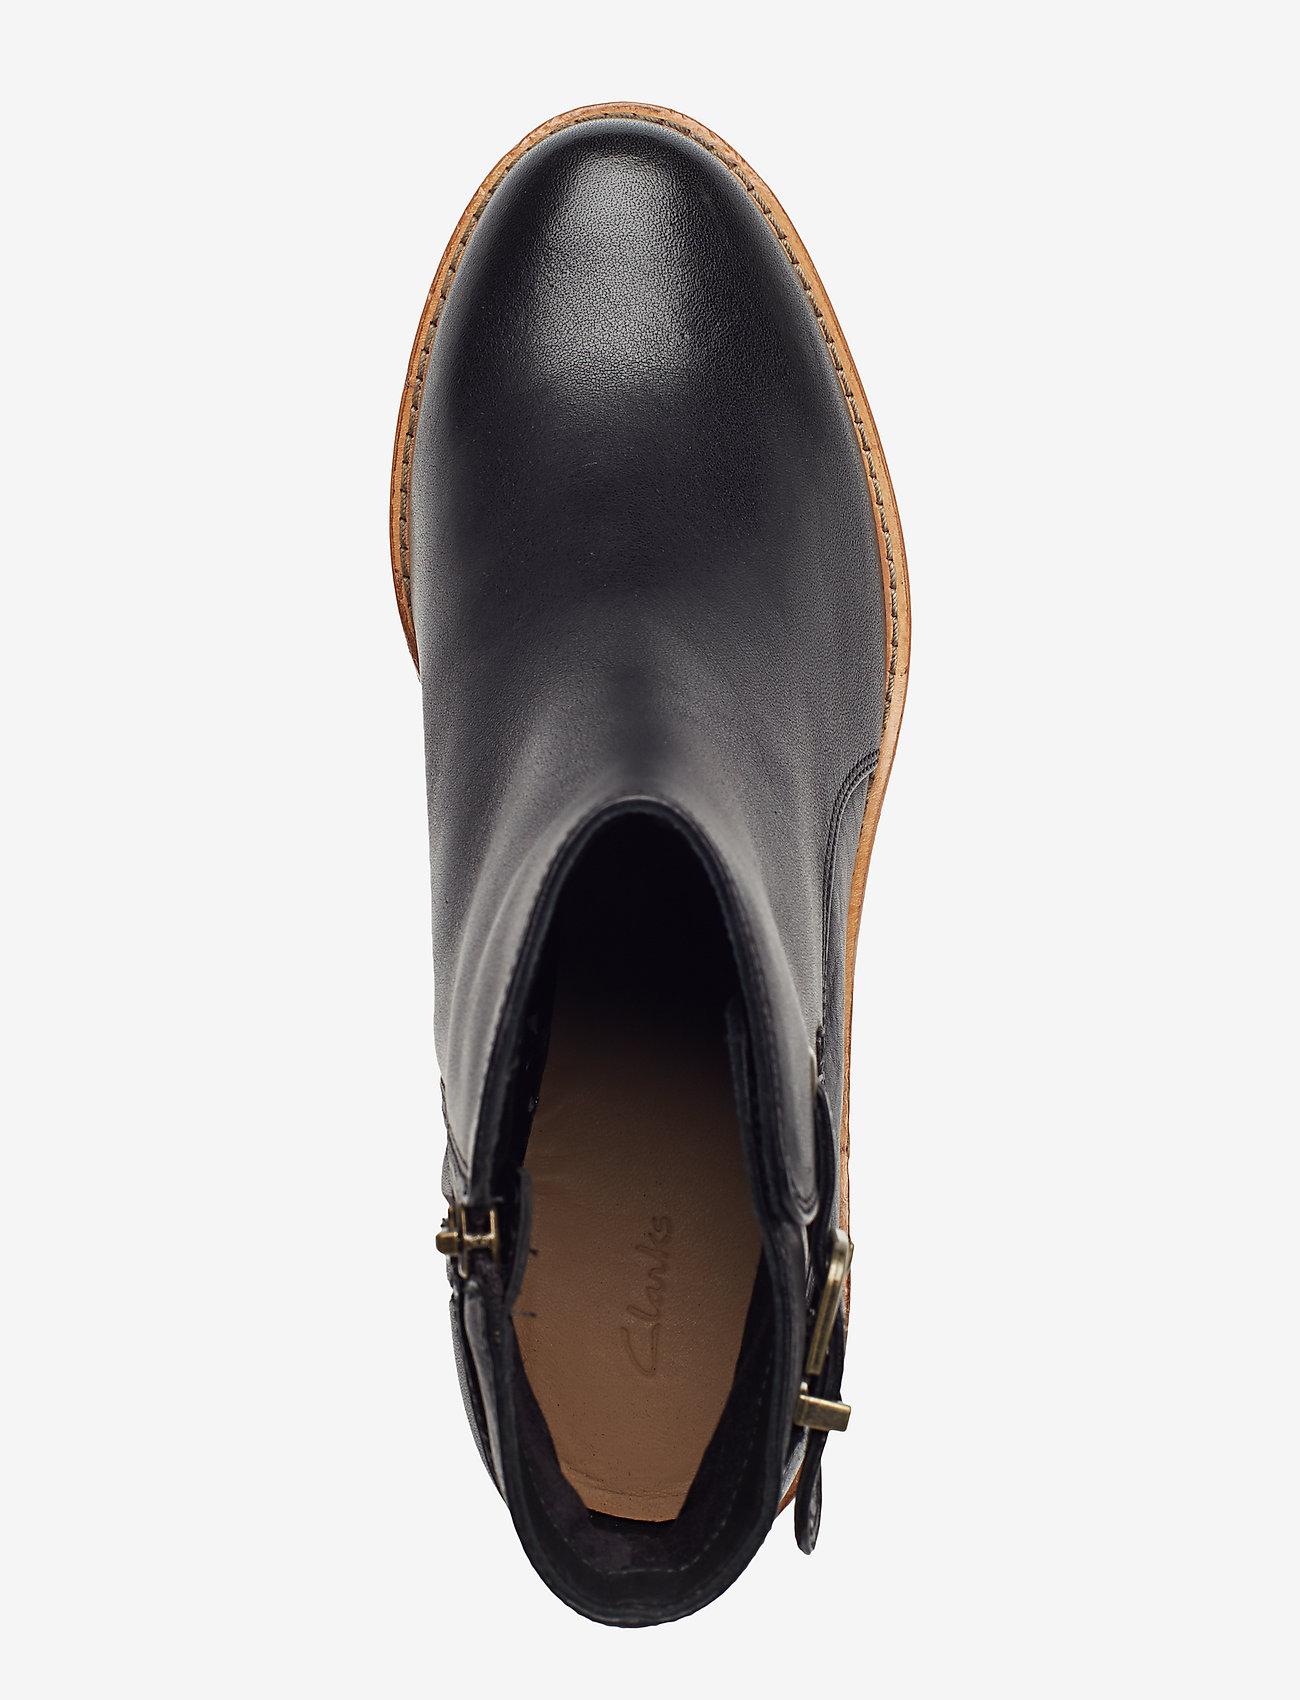 Clarkdale Jax (Black Leather) - Clarks